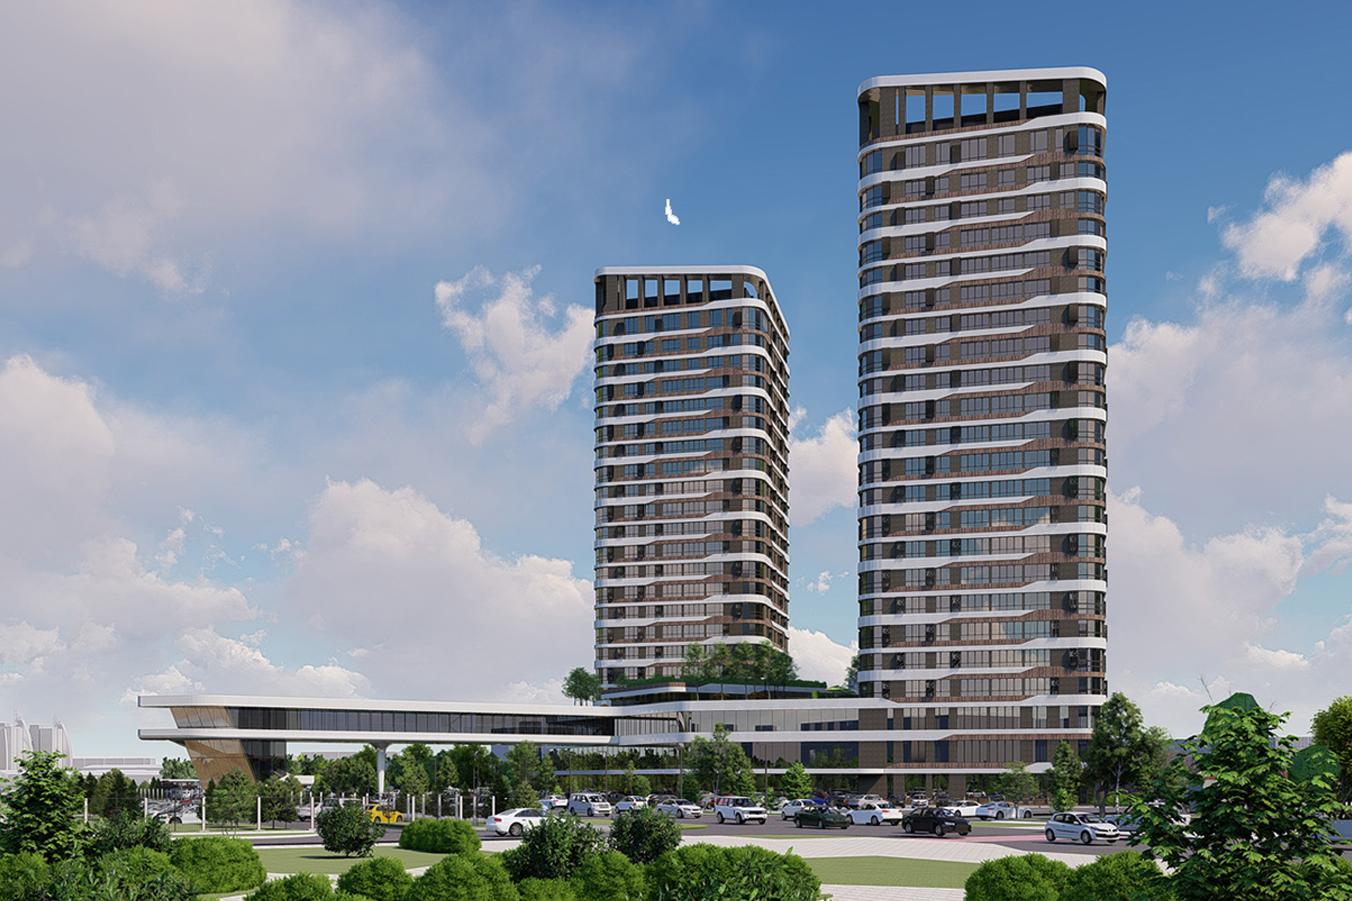 В башнях будет 432 квартиры